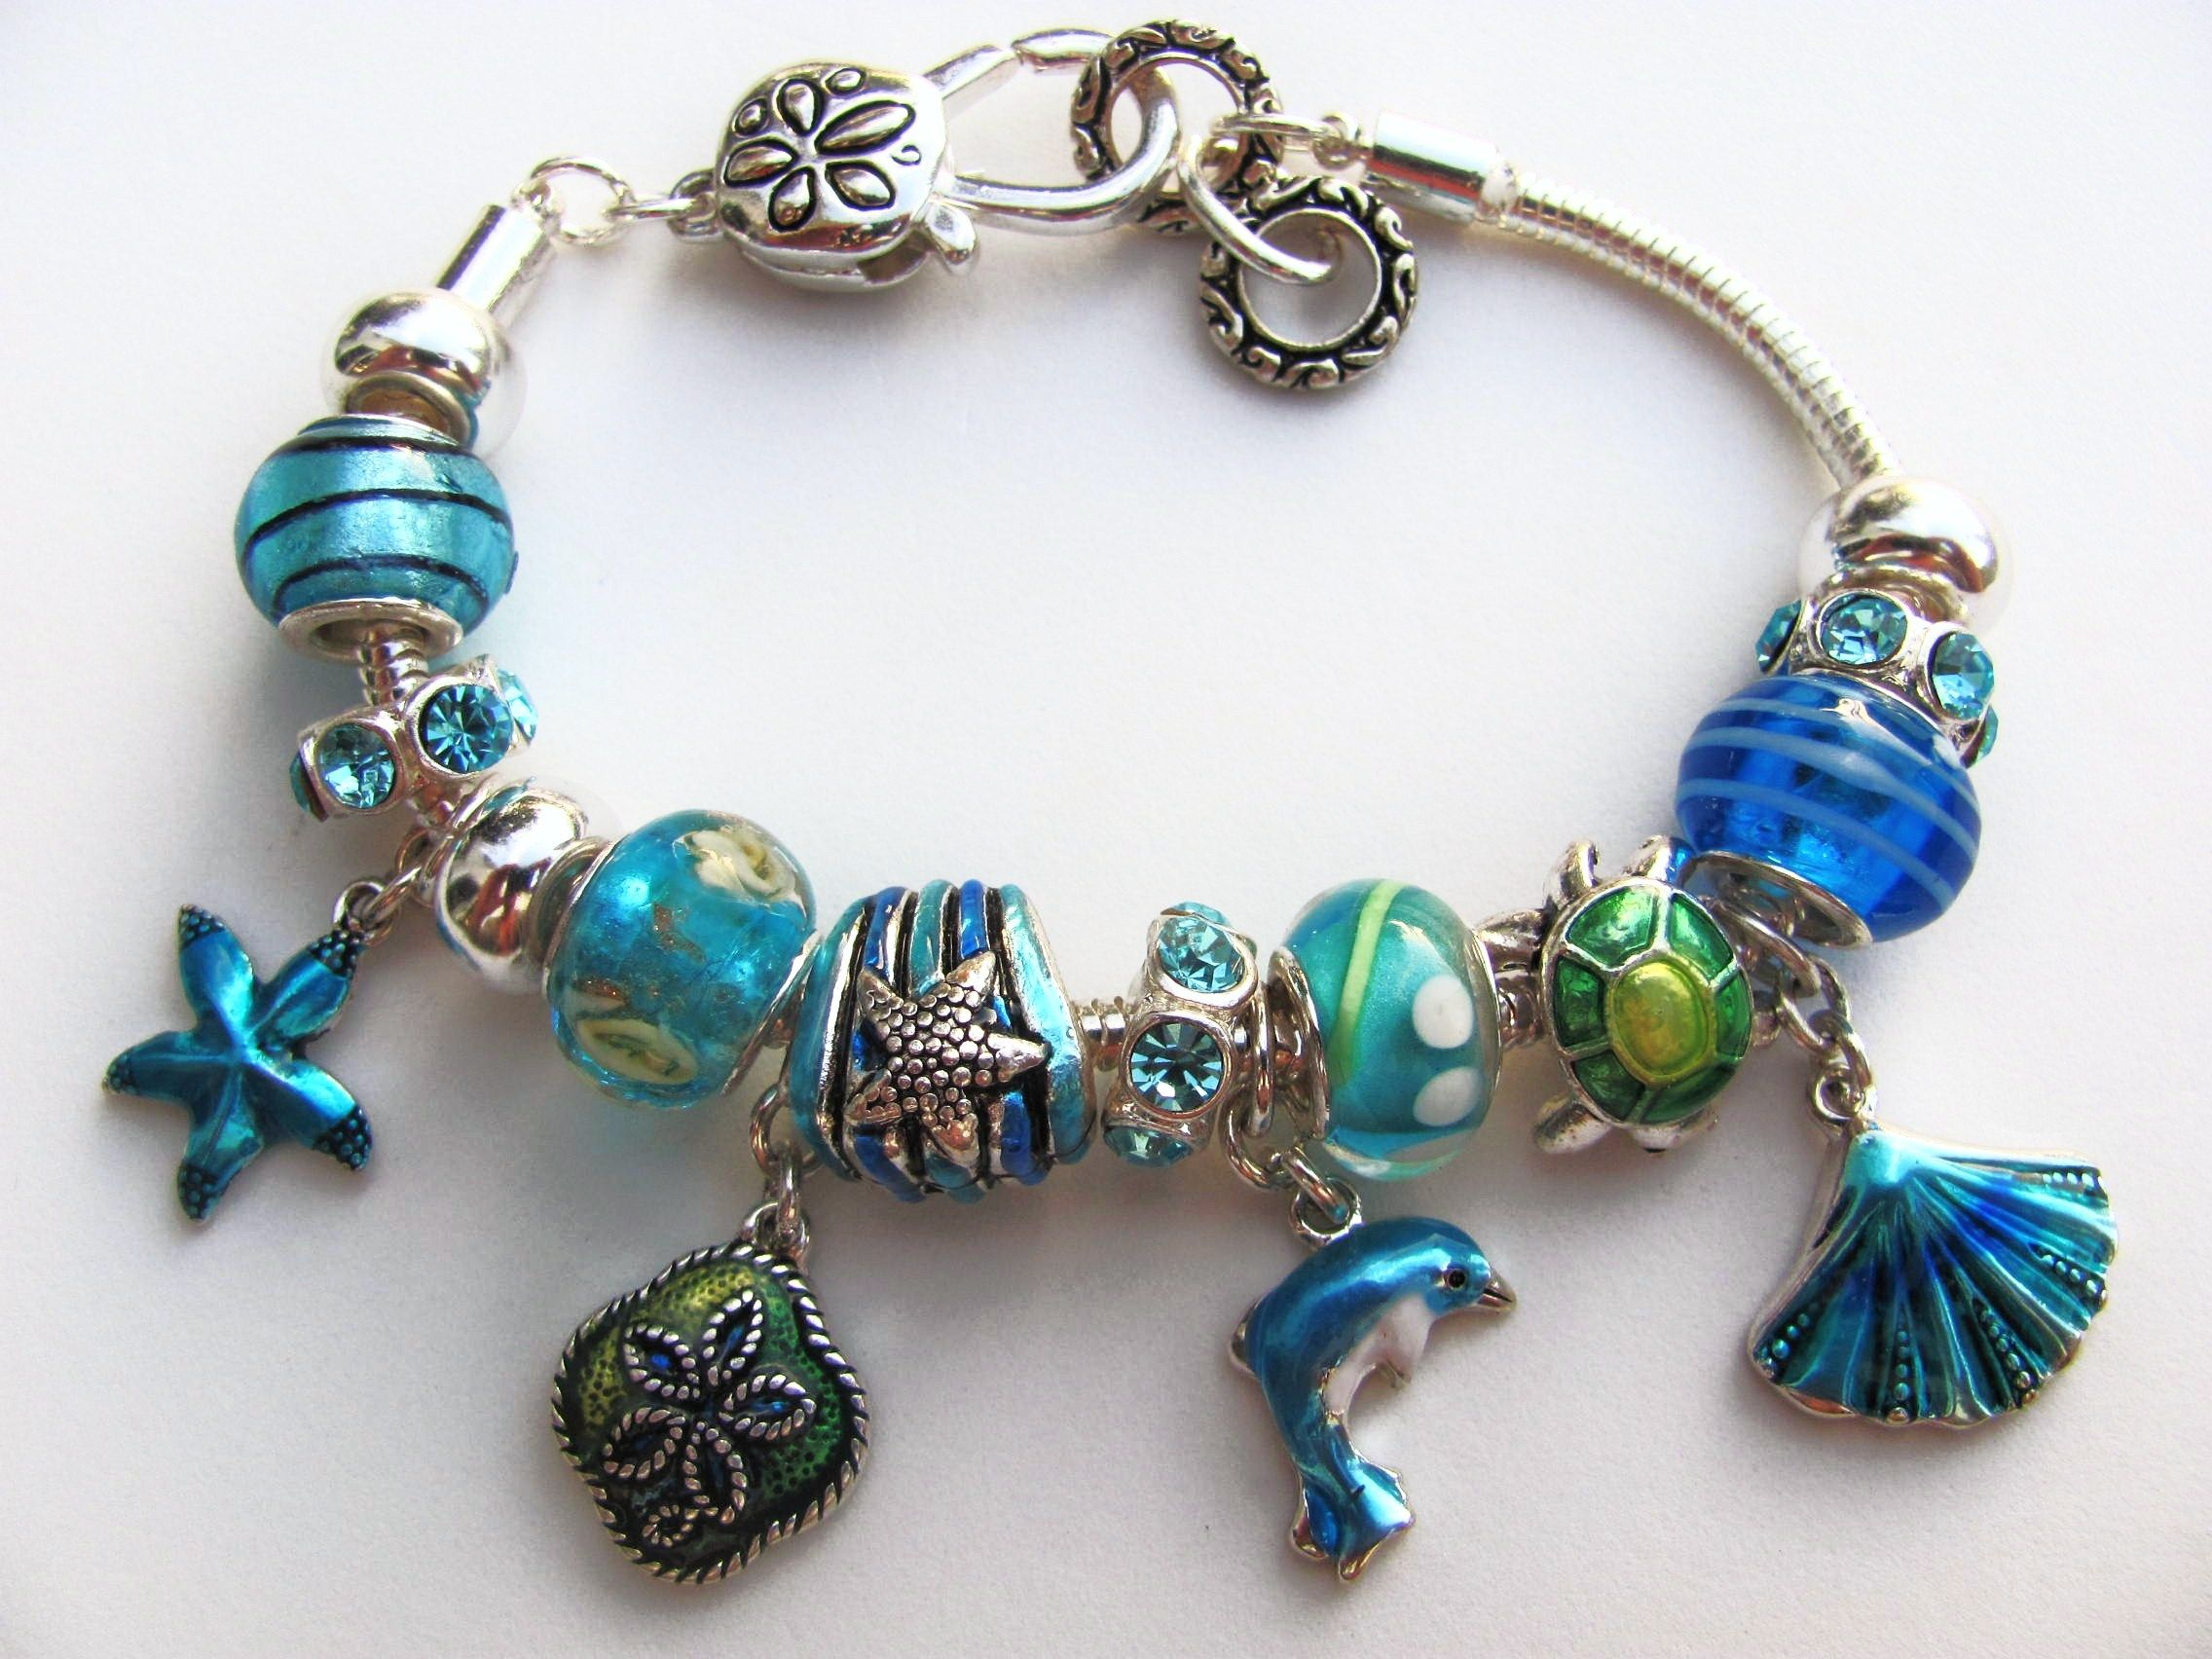 9957515fb Pandora Inspired Sea Life Charm Bracelet Seahorse Turtle Star Shell ...